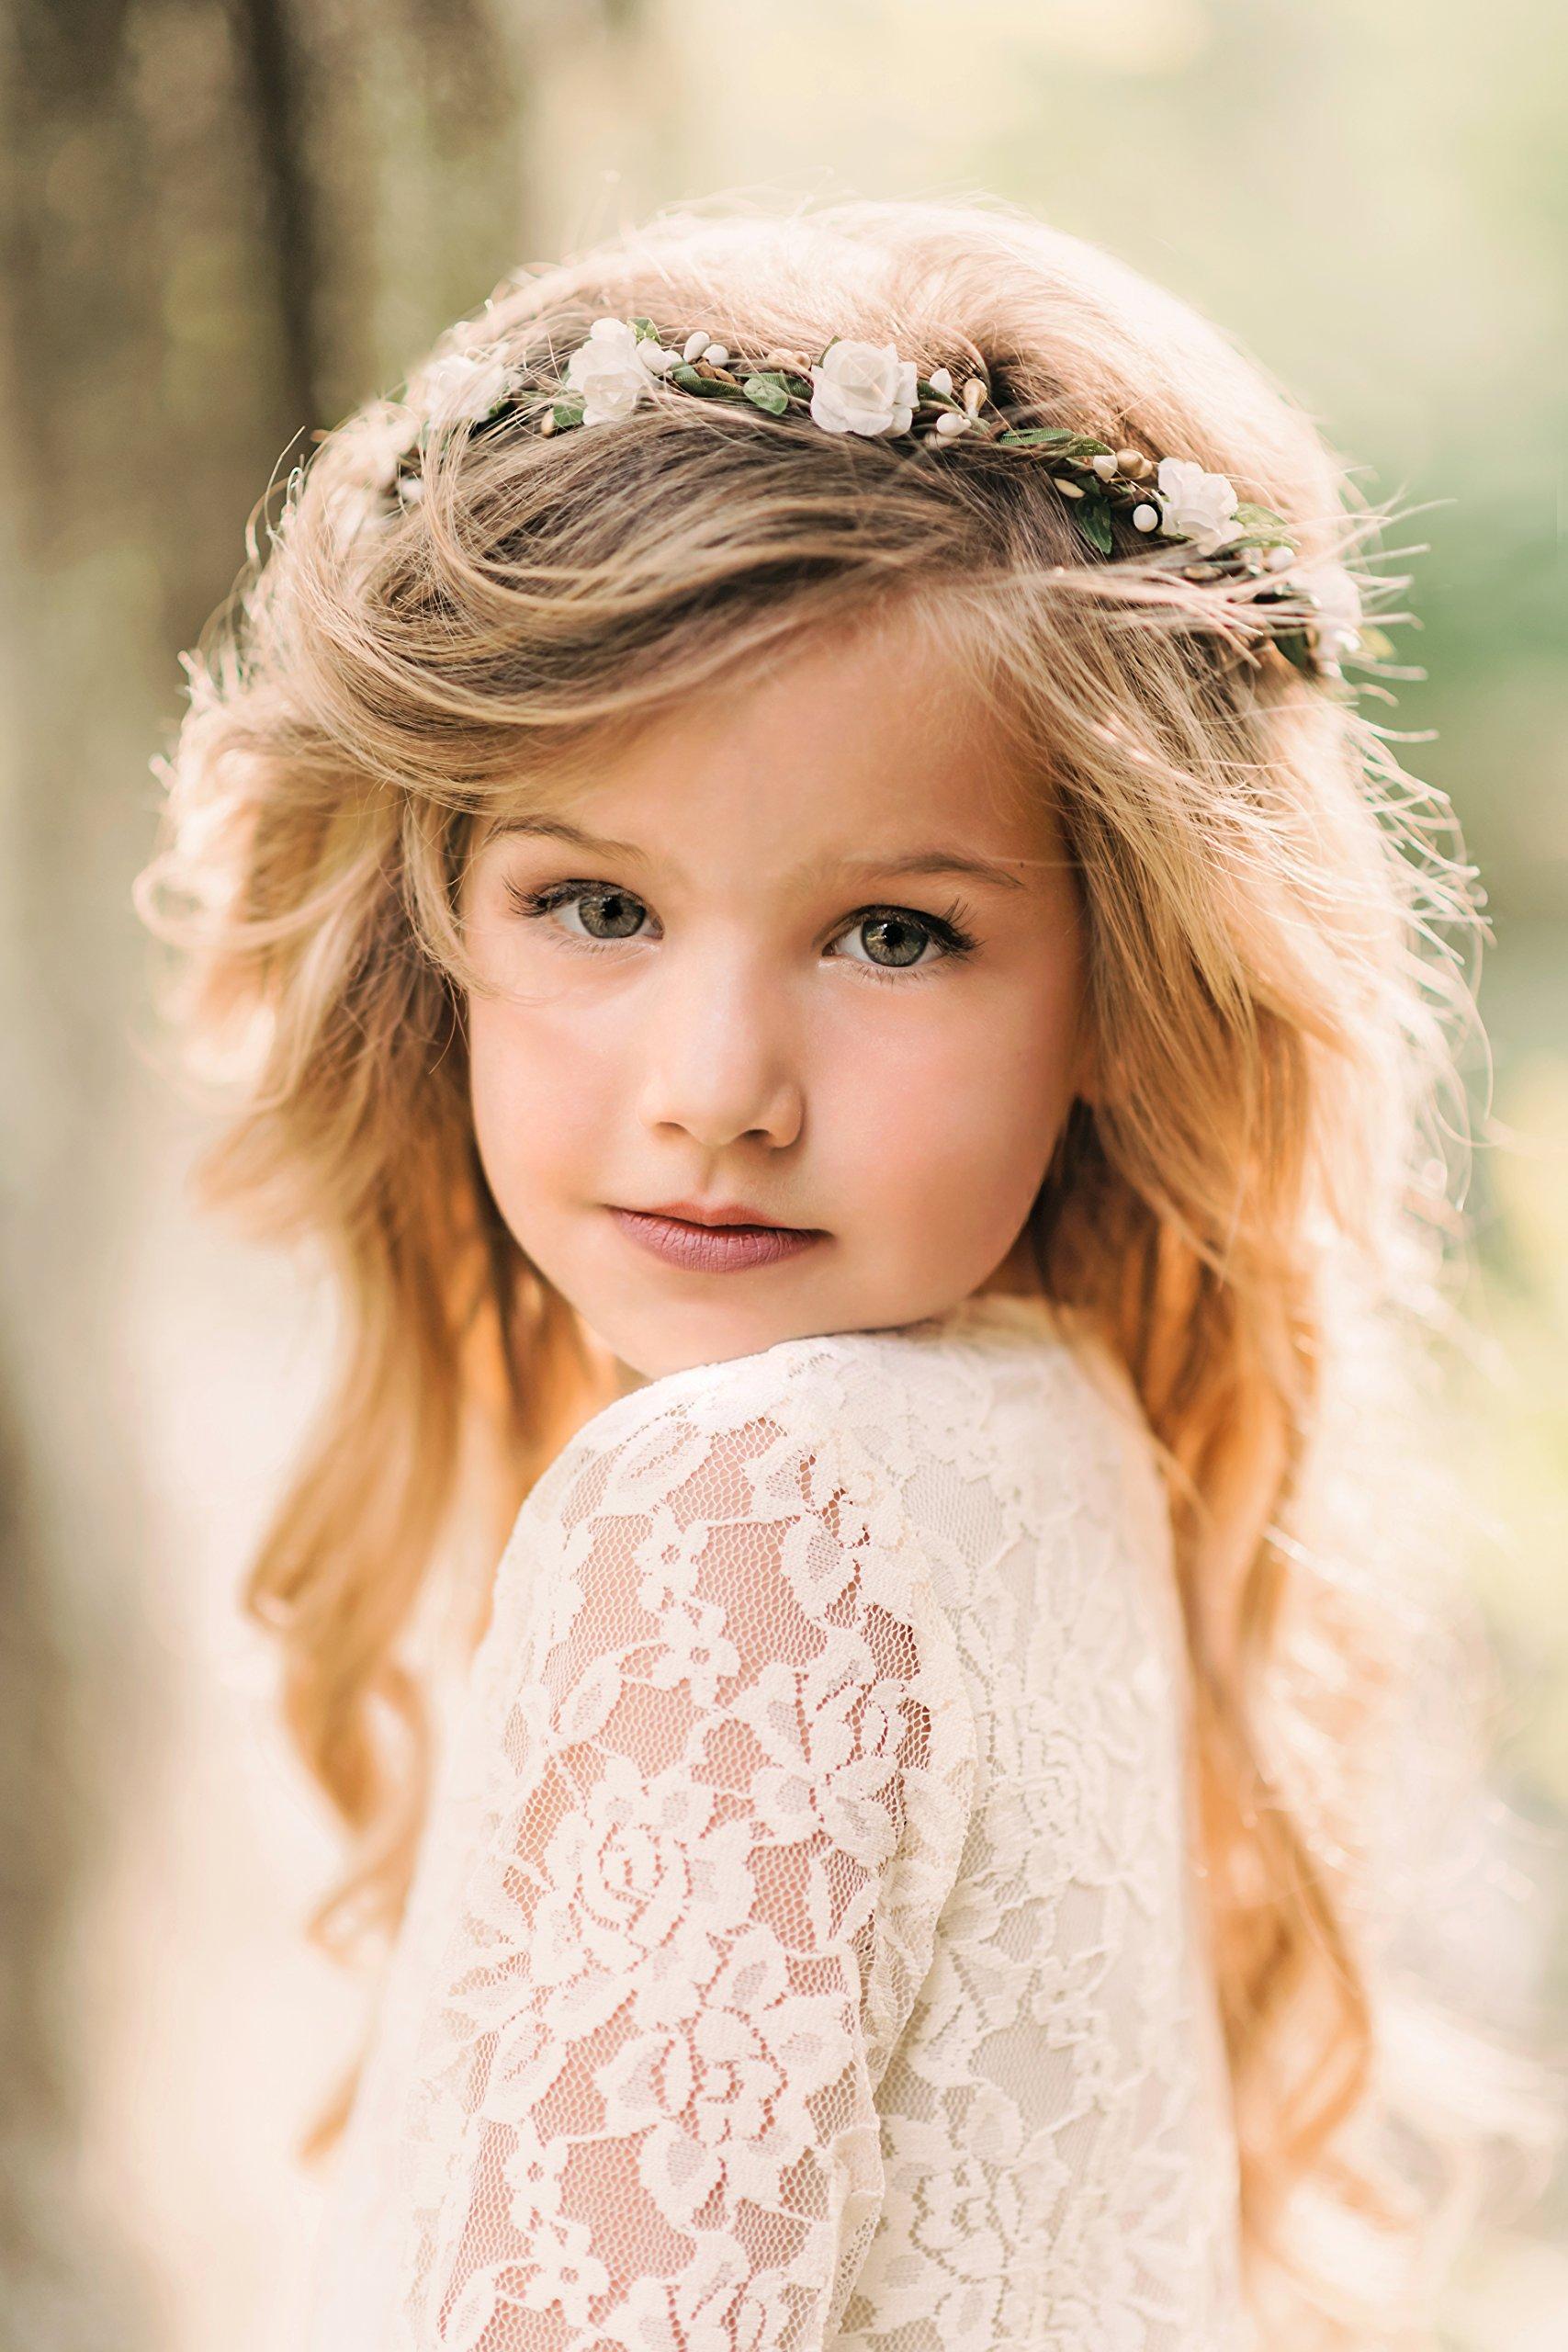 Flower Crown - Flower Wreath - Bridal Halo - Flower Girl